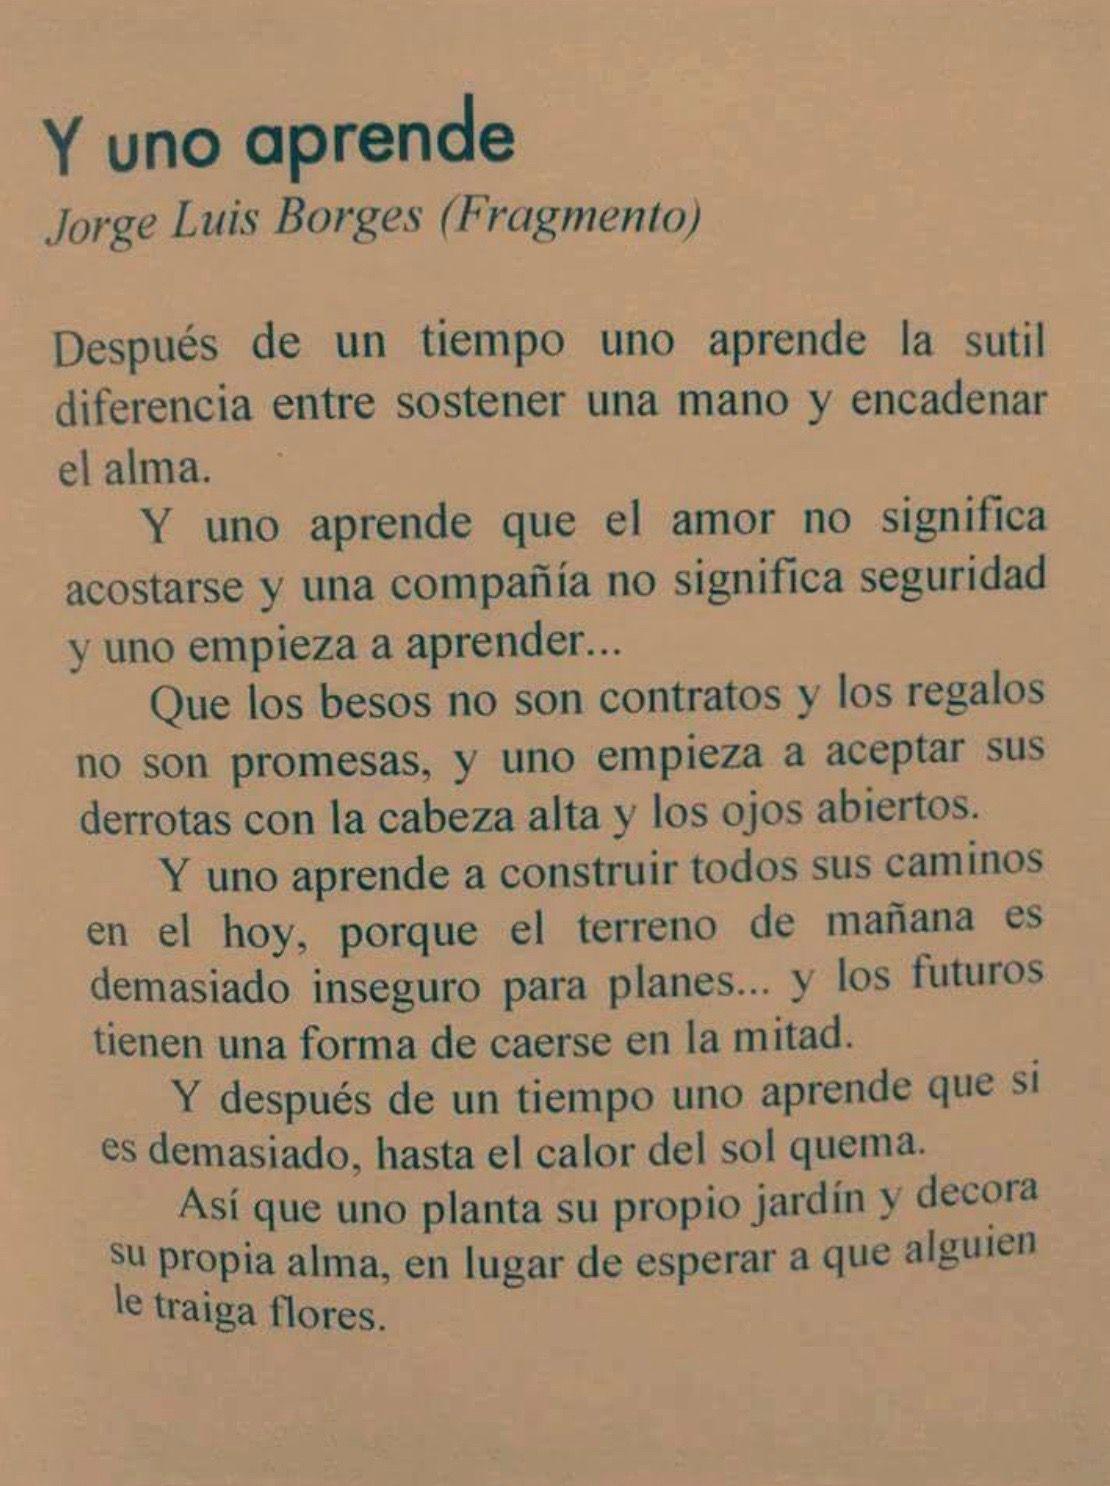 Pin De Becca Ceh En Pensamientos Pinterest Luis Borges Frases